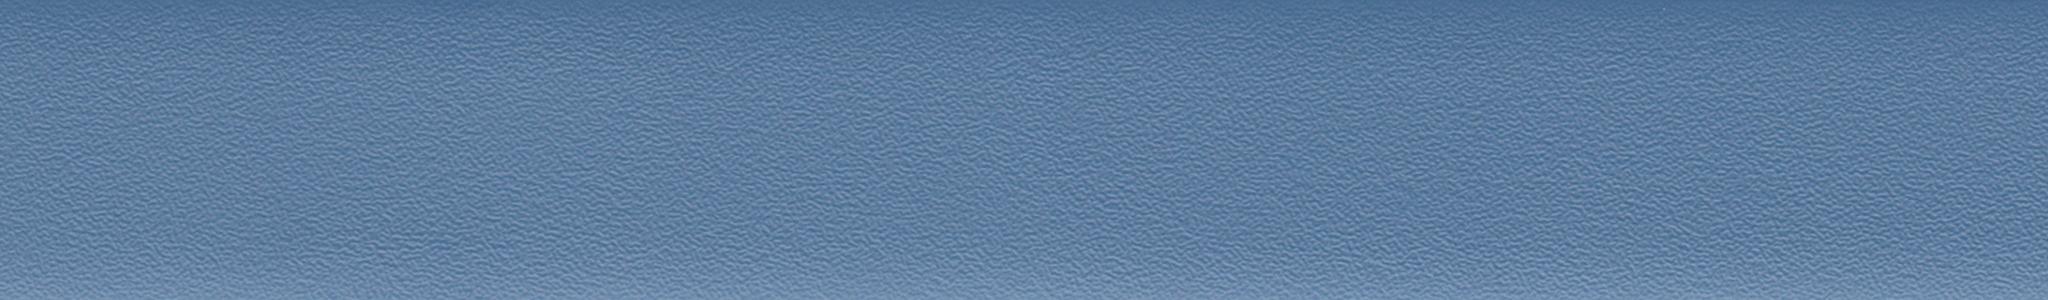 HU 15127 ABS Kante UNI Blau perl 101